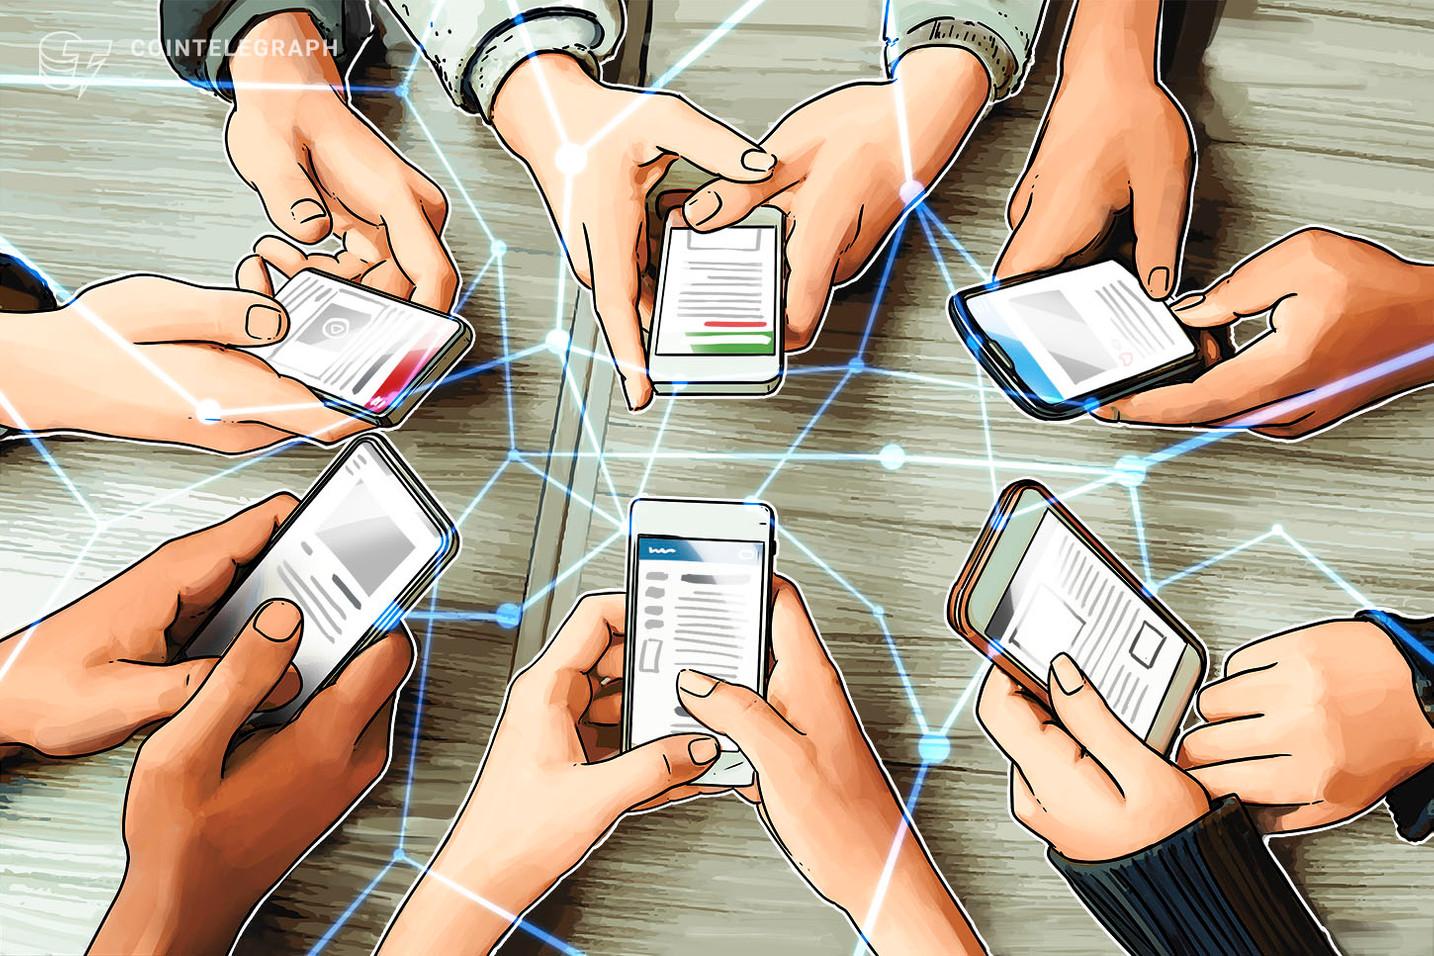 Signal under fire over MobileCoin partnership